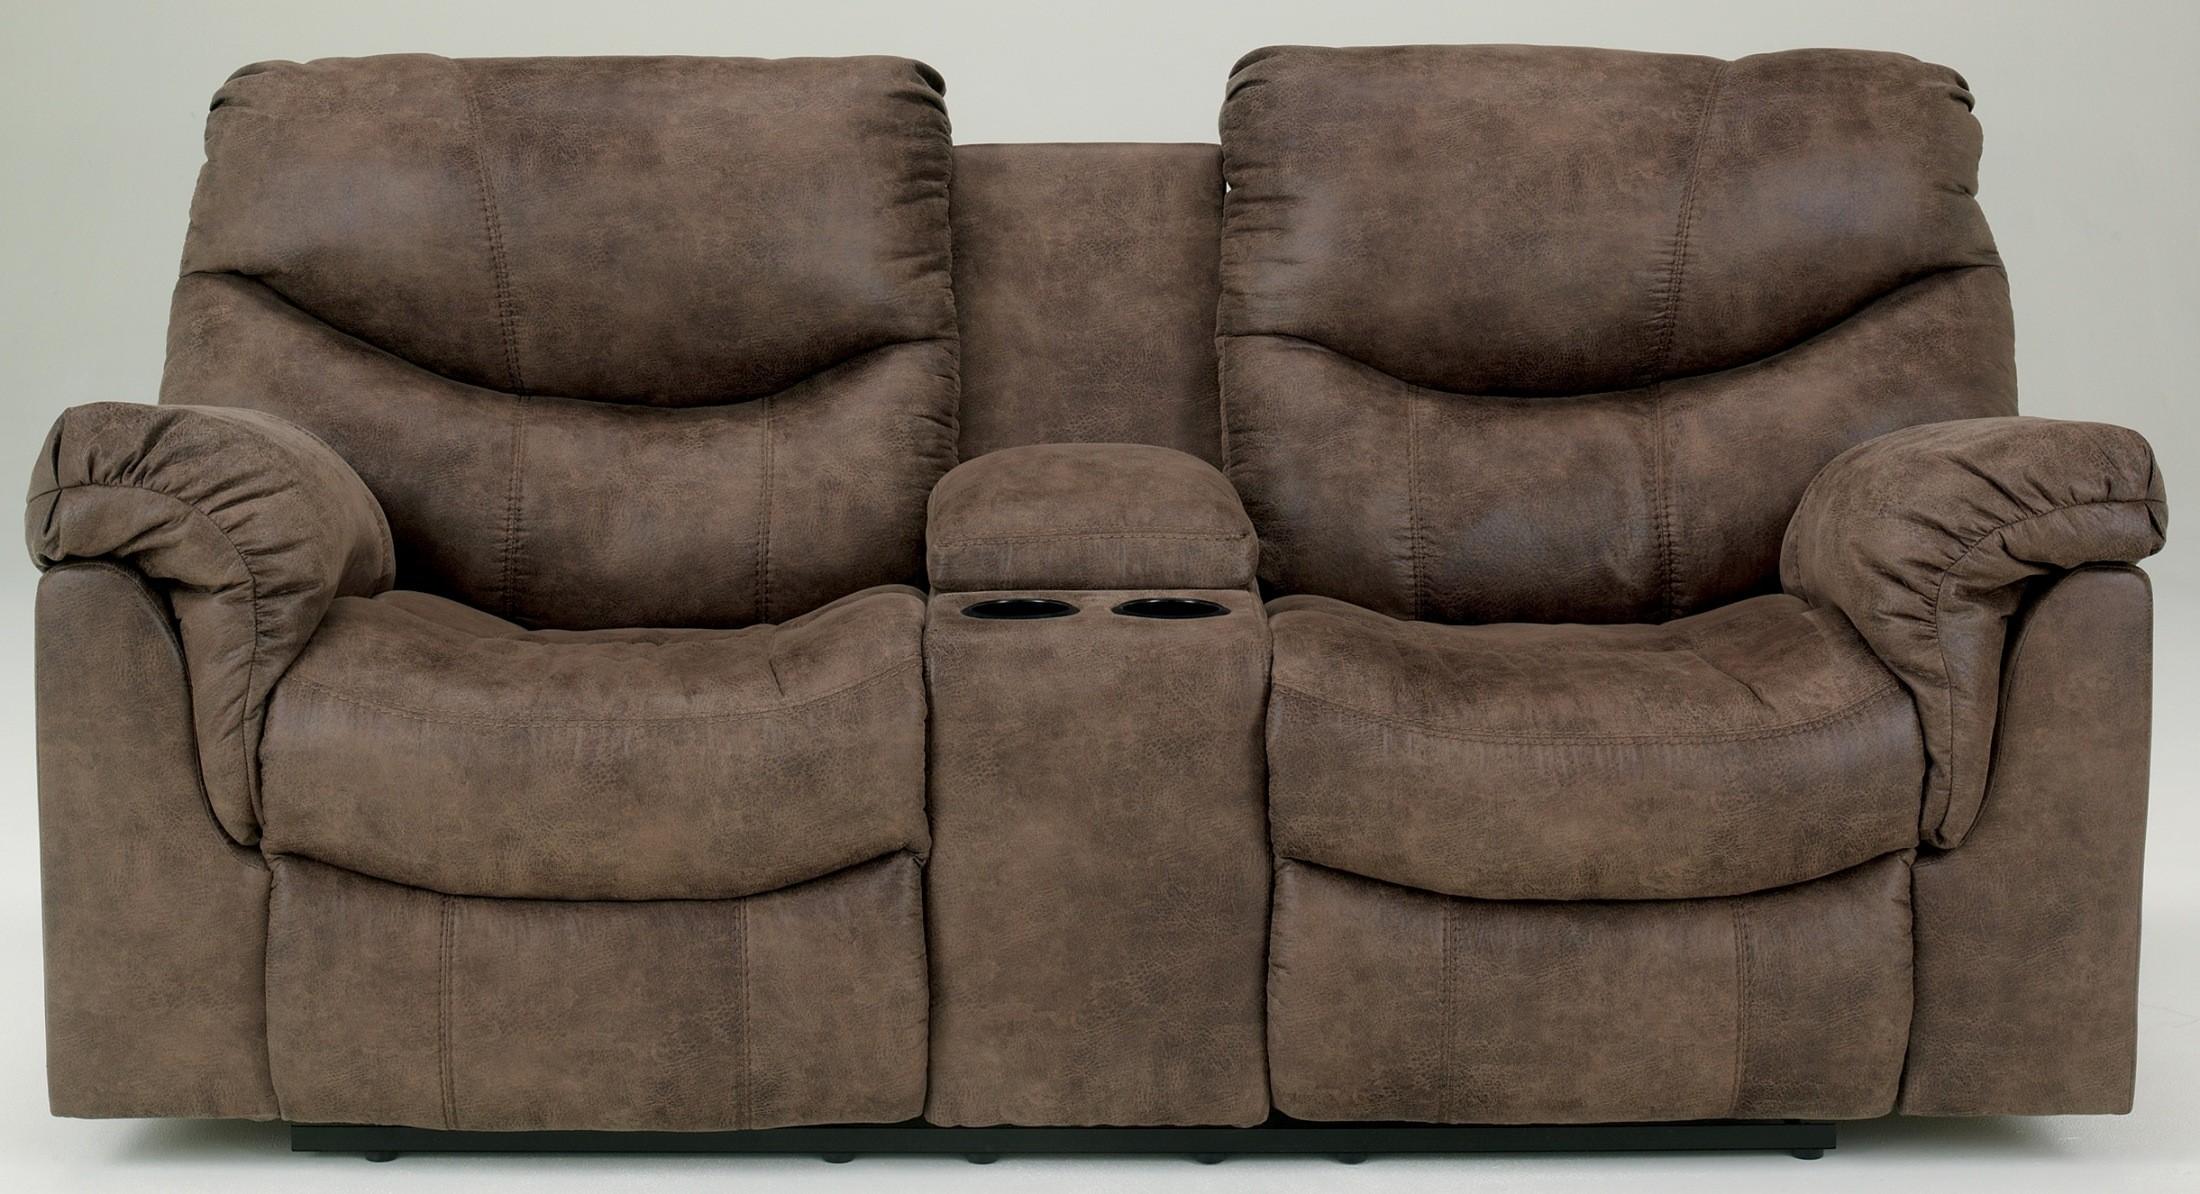 Ashley Furniture Rocker Recliner Loveseat